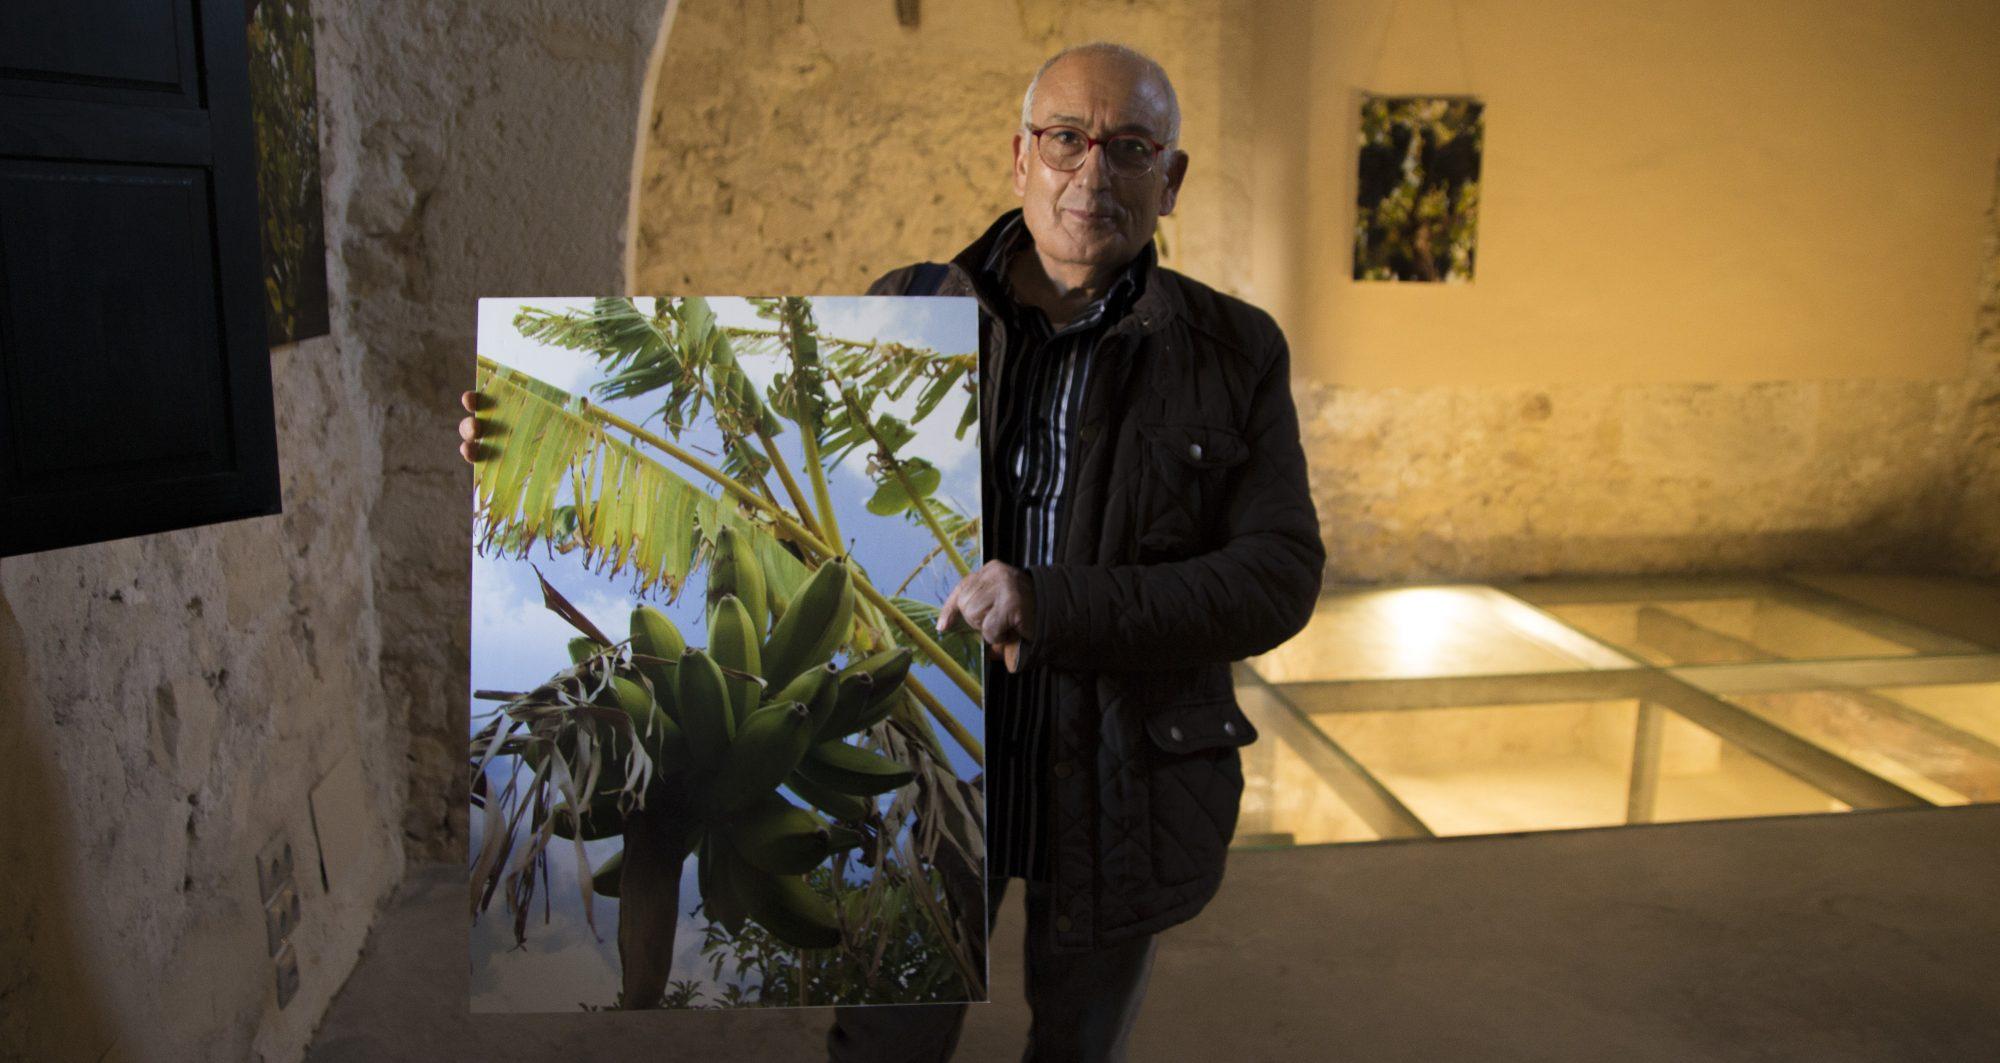 Agroecoligía Toni Ferri